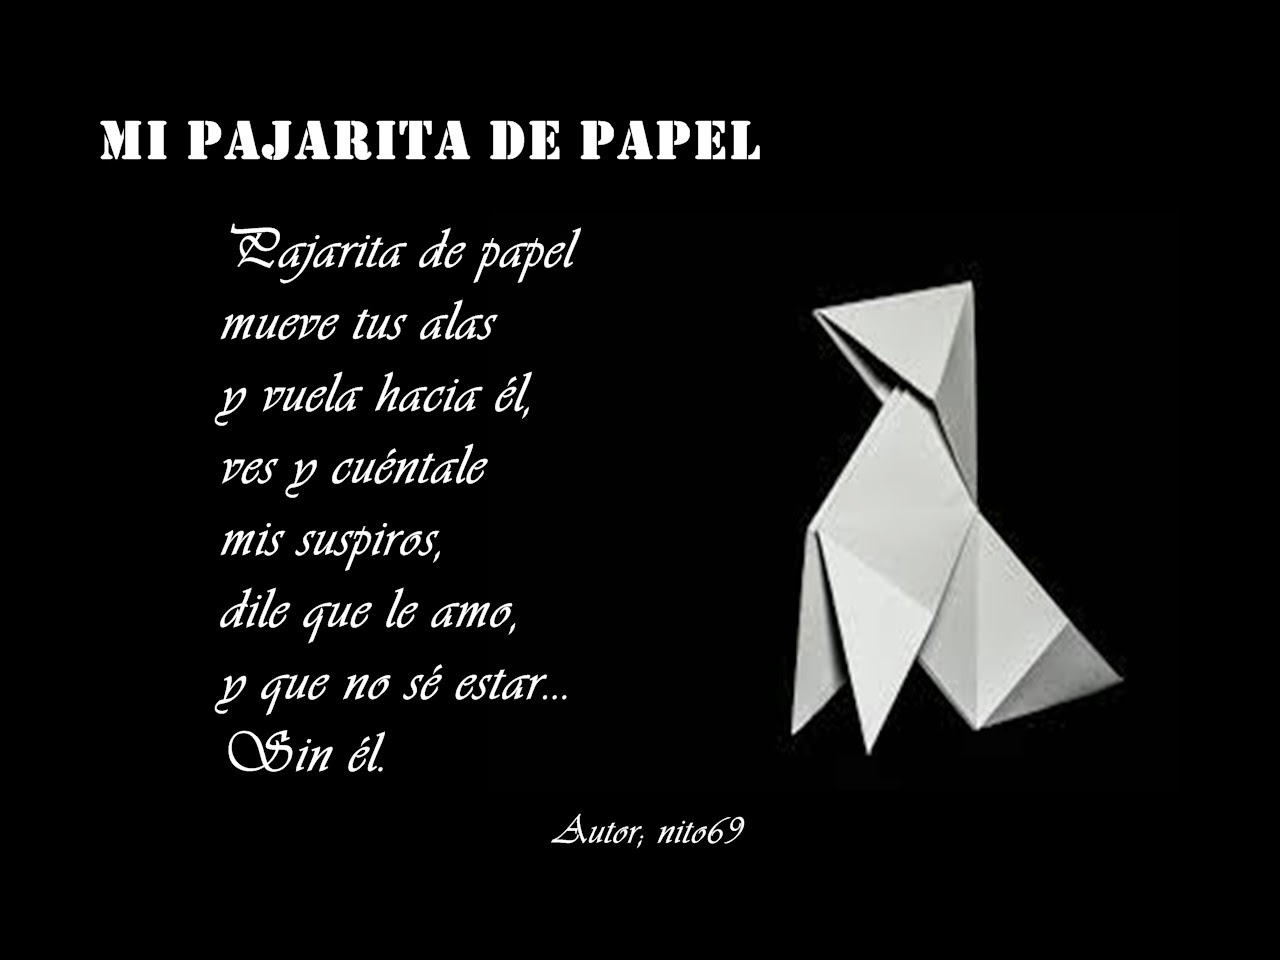 MI PAJARITA DE PAPEL